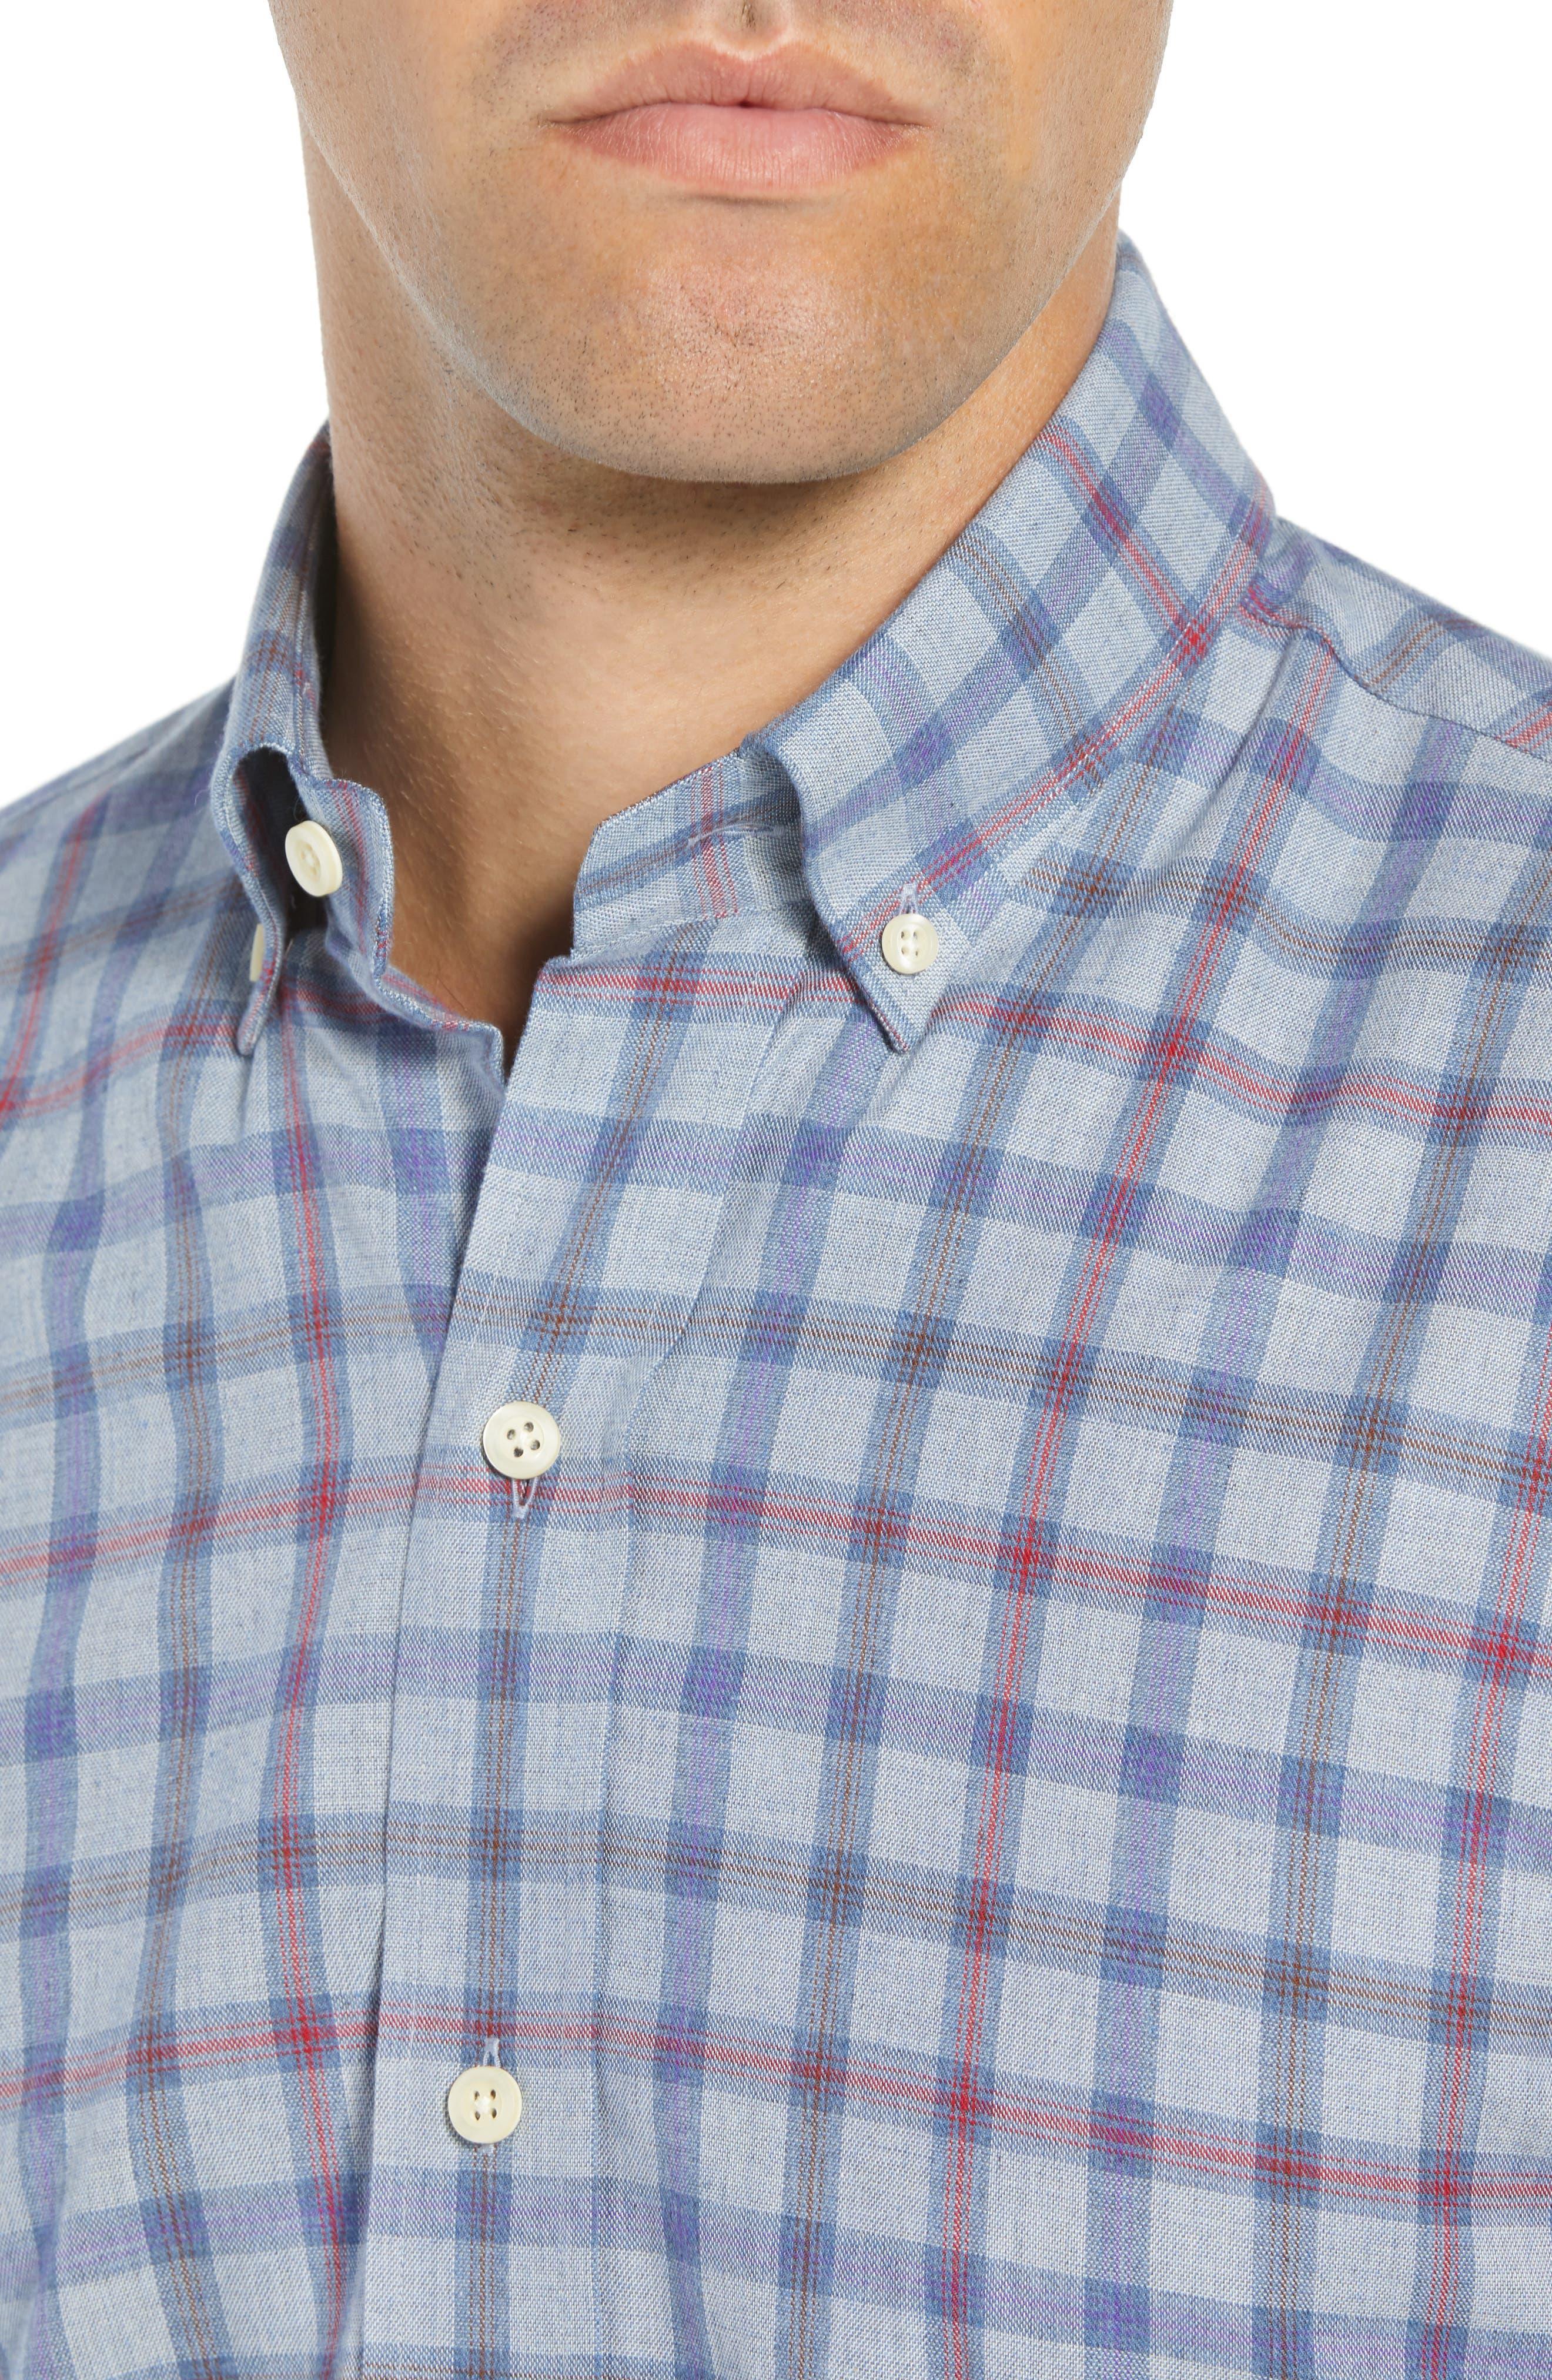 Hilbank Trim Fit Check Dress Shirt,                             Alternate thumbnail 2, color,                             CADET BLUE